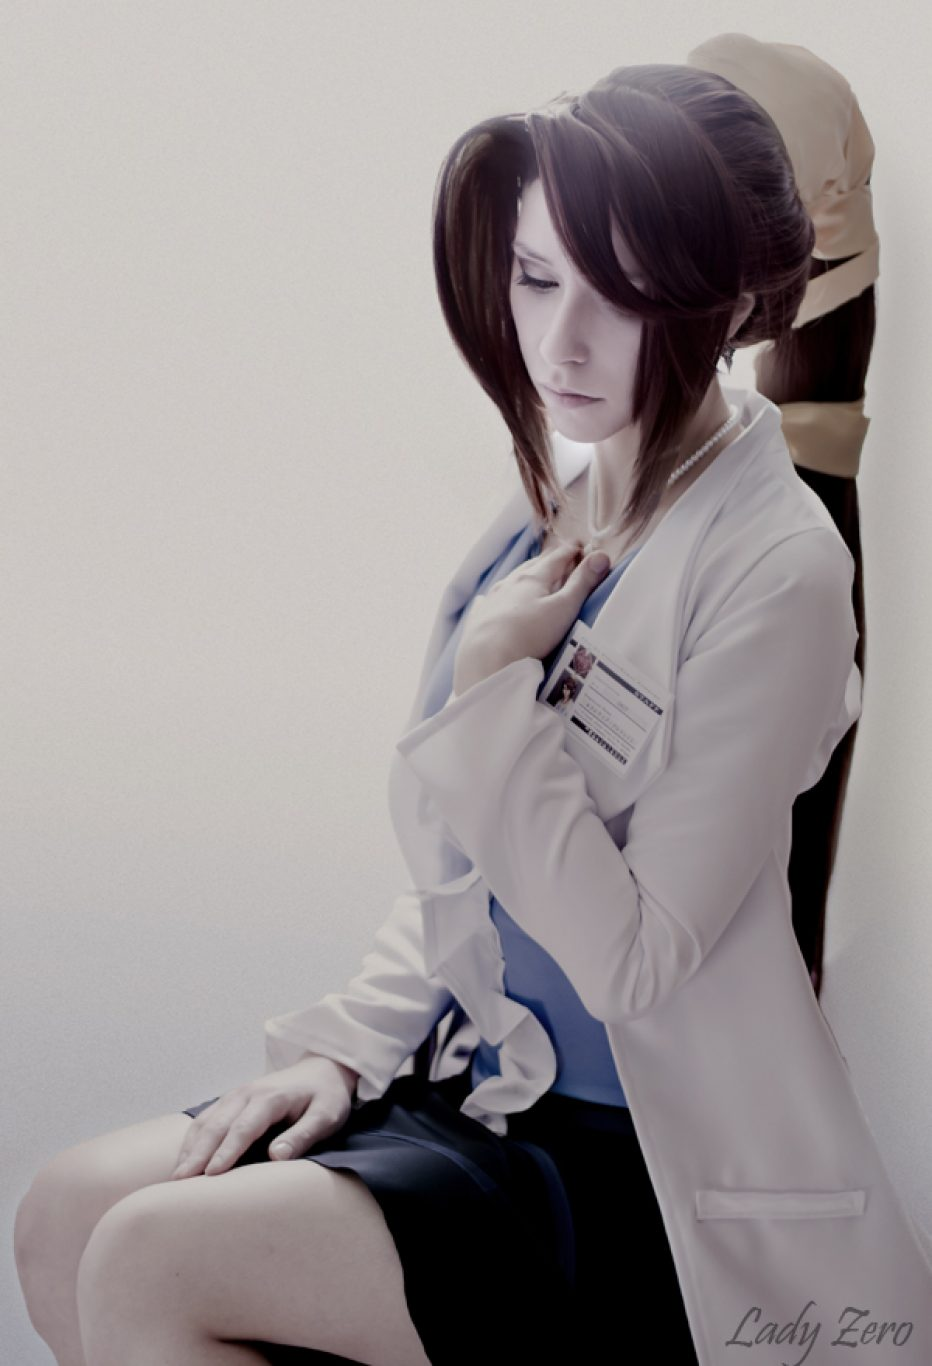 Final-Fantasy-VII-Lucrecia-Crescent-Cosplay-Gamers-Heroes-1.jpg